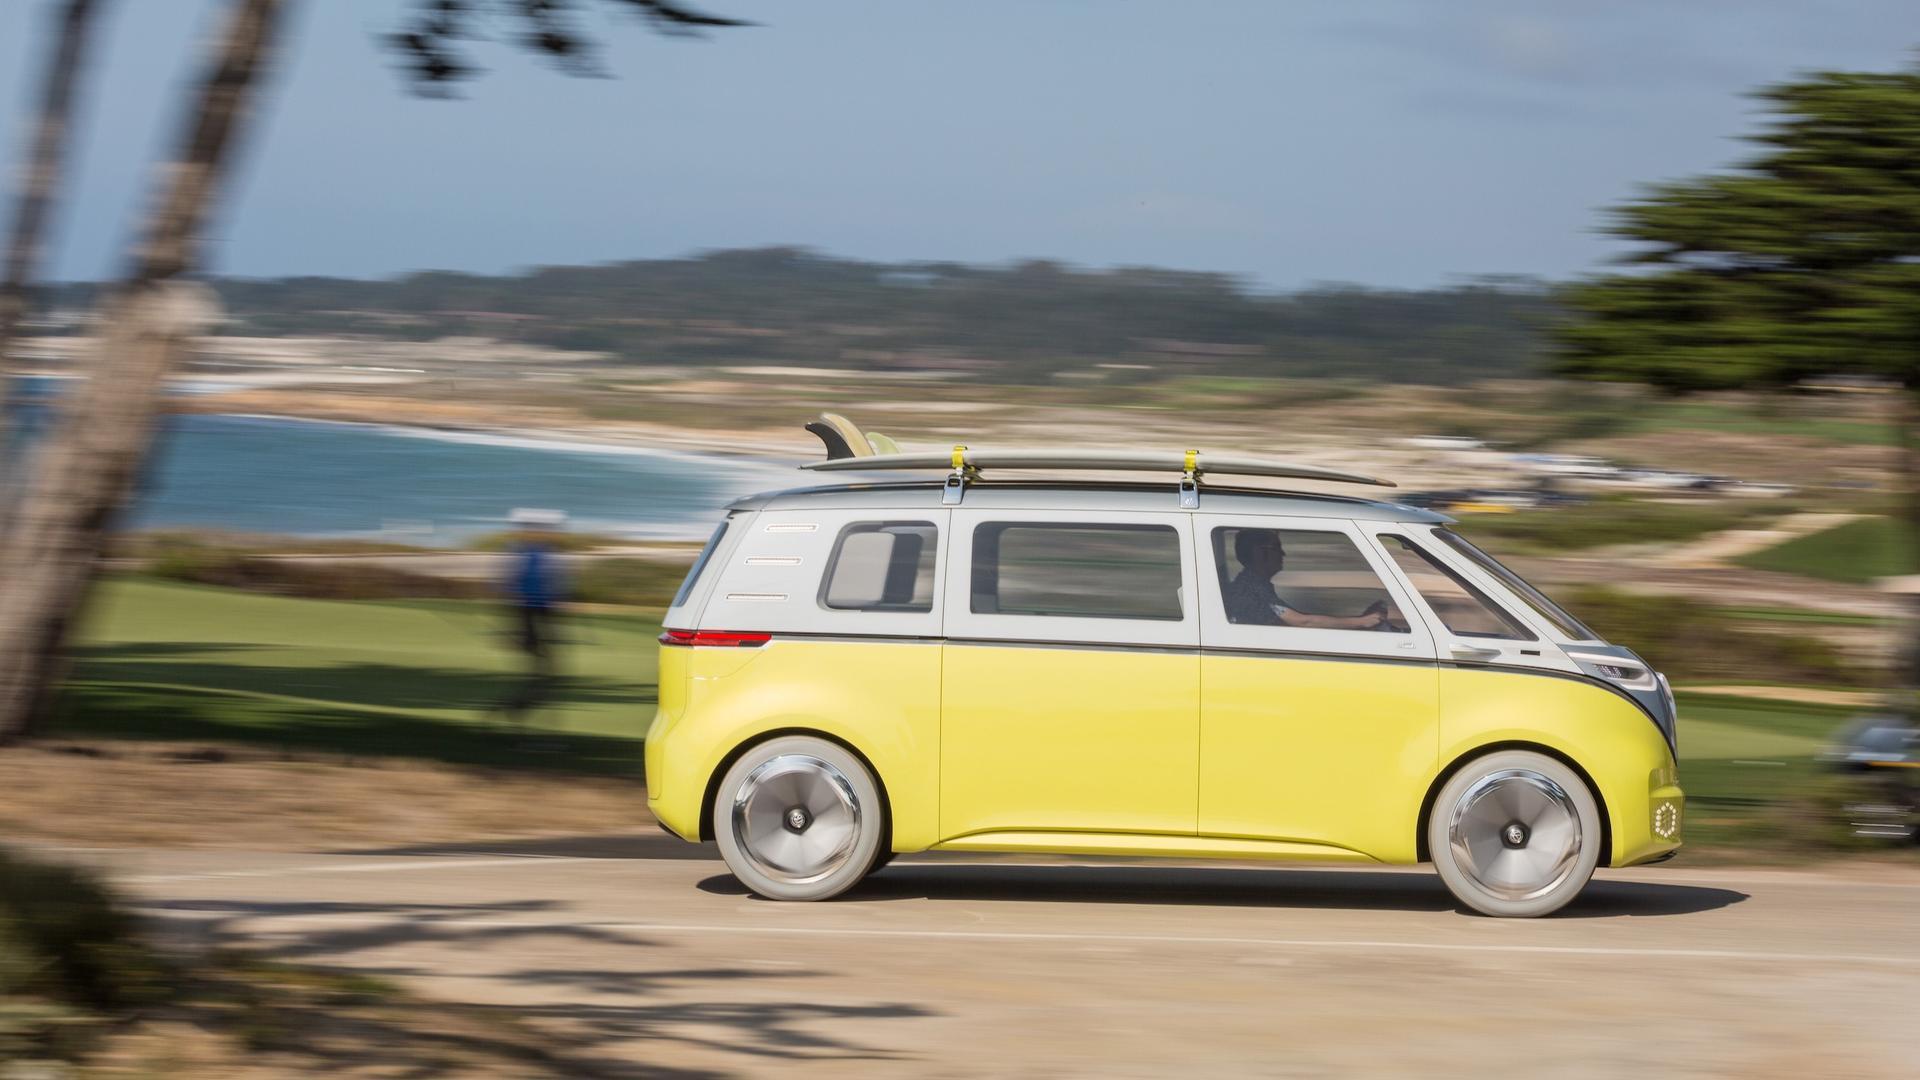 2021 VW Bulli Exterior and Interior